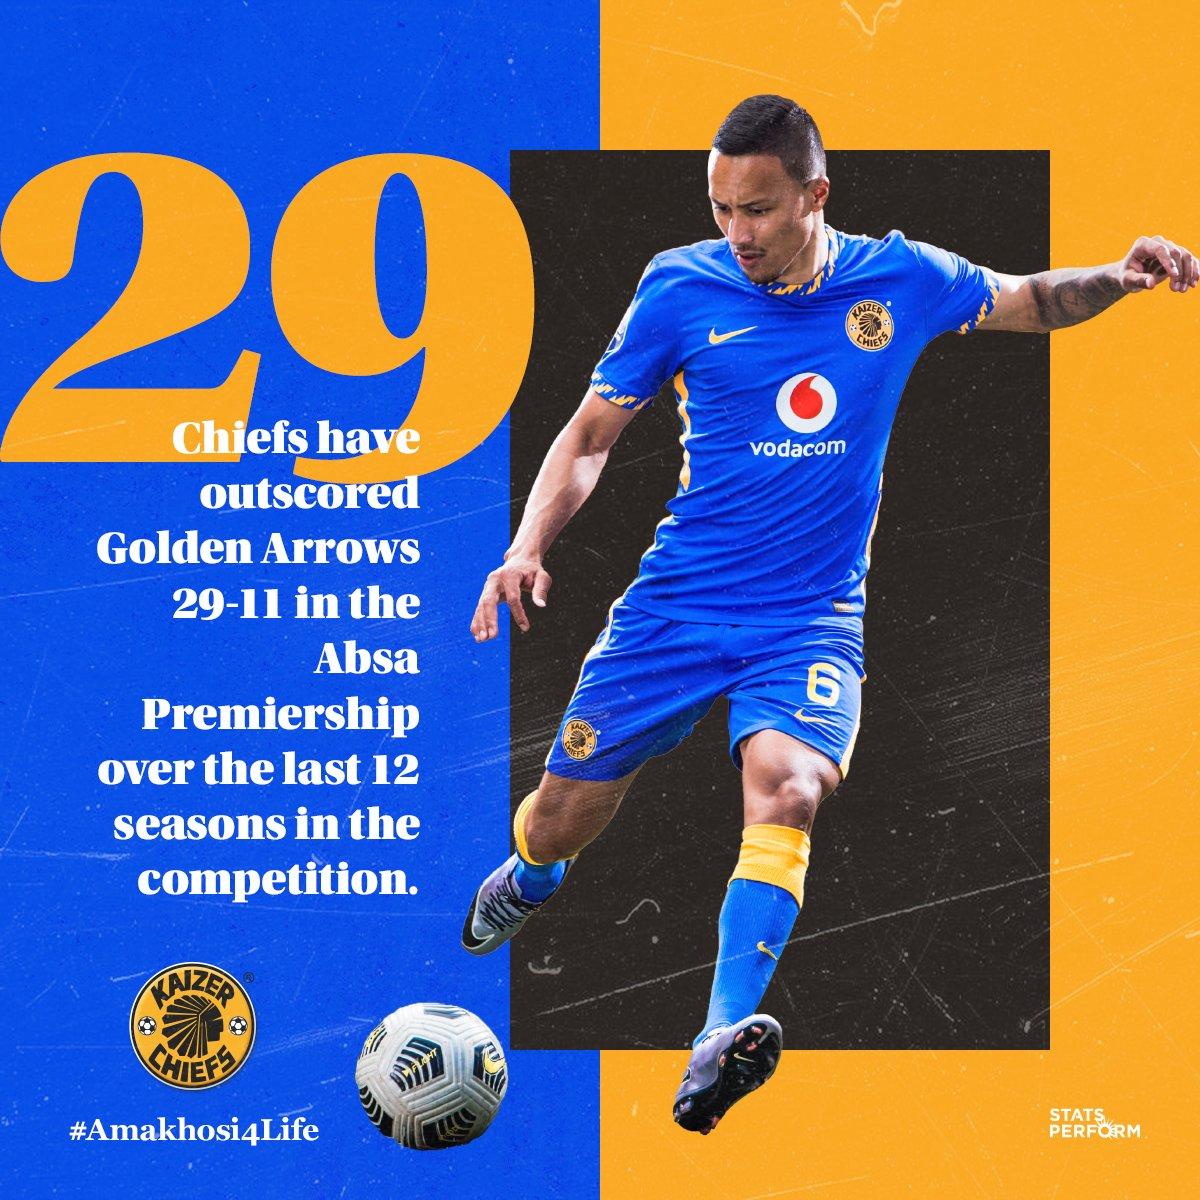 Next Kaizer Chiefs Match!  🏆 #DStvPrem ⚽️ Golden Arrows vs. Kaizer Chiefs  👕First Team 🗓️Saturday 21 November 2020 🏟Sugar Ray Xulu Stadium  🕞15h30 📺SS202 📢NO FANS ALLOWED INSIDE OR OUTSIDE THE STADIUM!!!! https://t.co/2IadfGaOyT